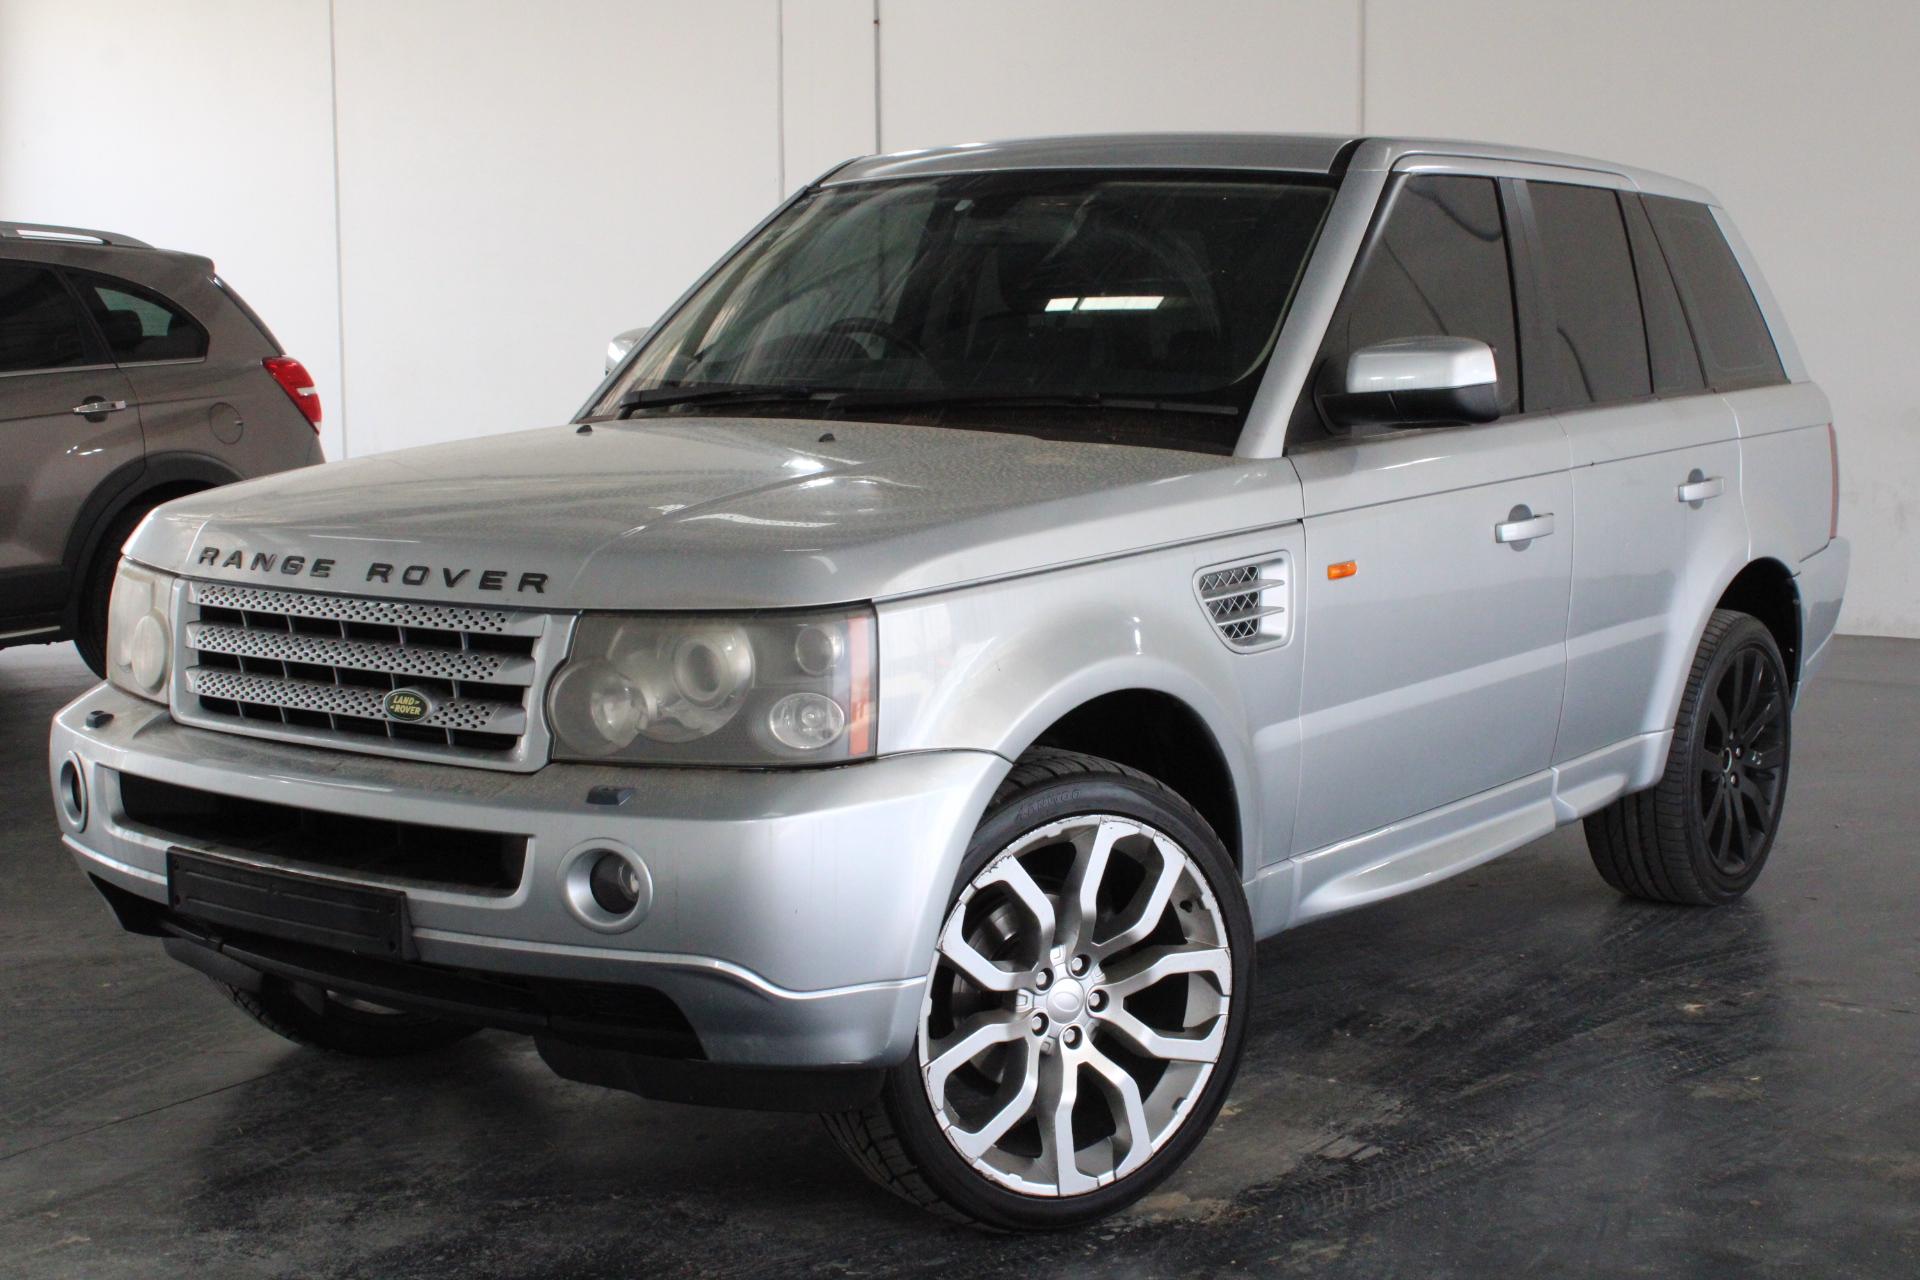 2007 Land Rover Range Rover Sport TDV6 Turbo Diesel Automatic Wagon